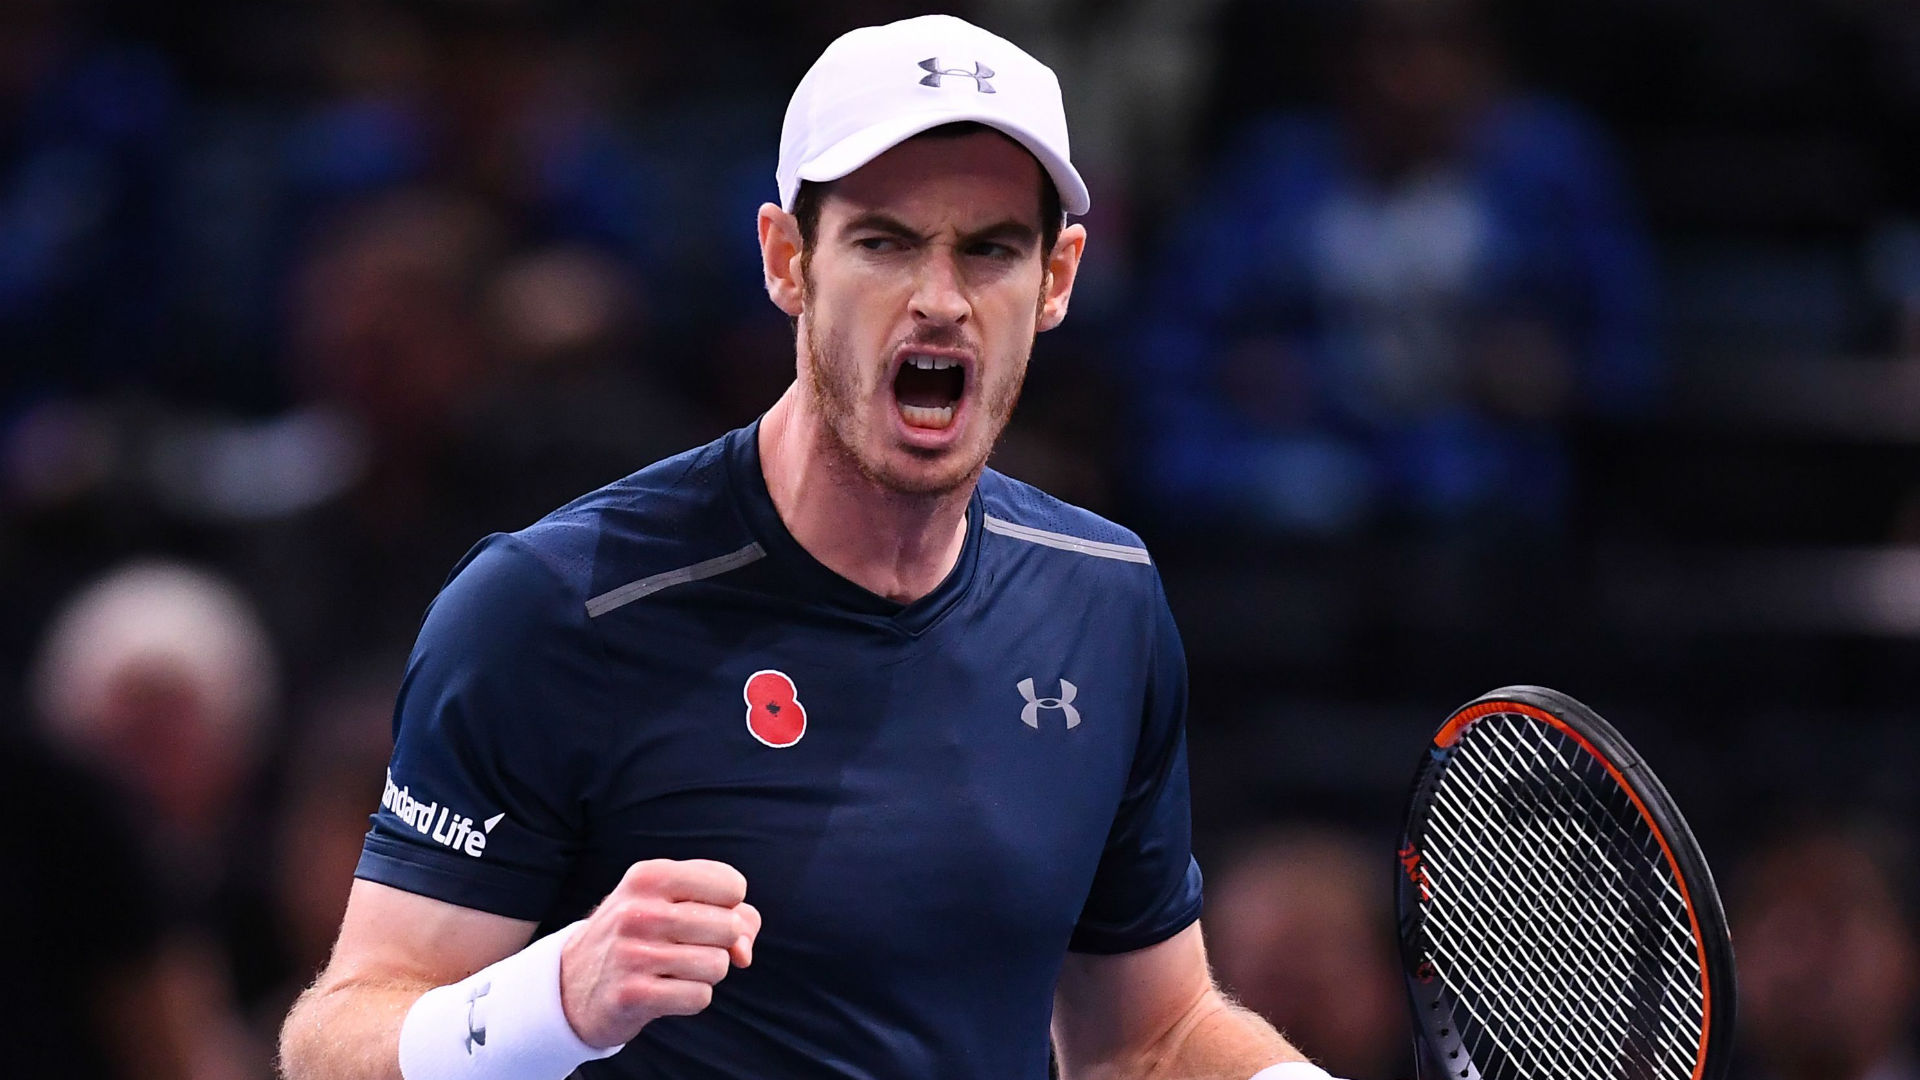 Andy Murray Set to Dethrone Novak Djokovic as World Number 1